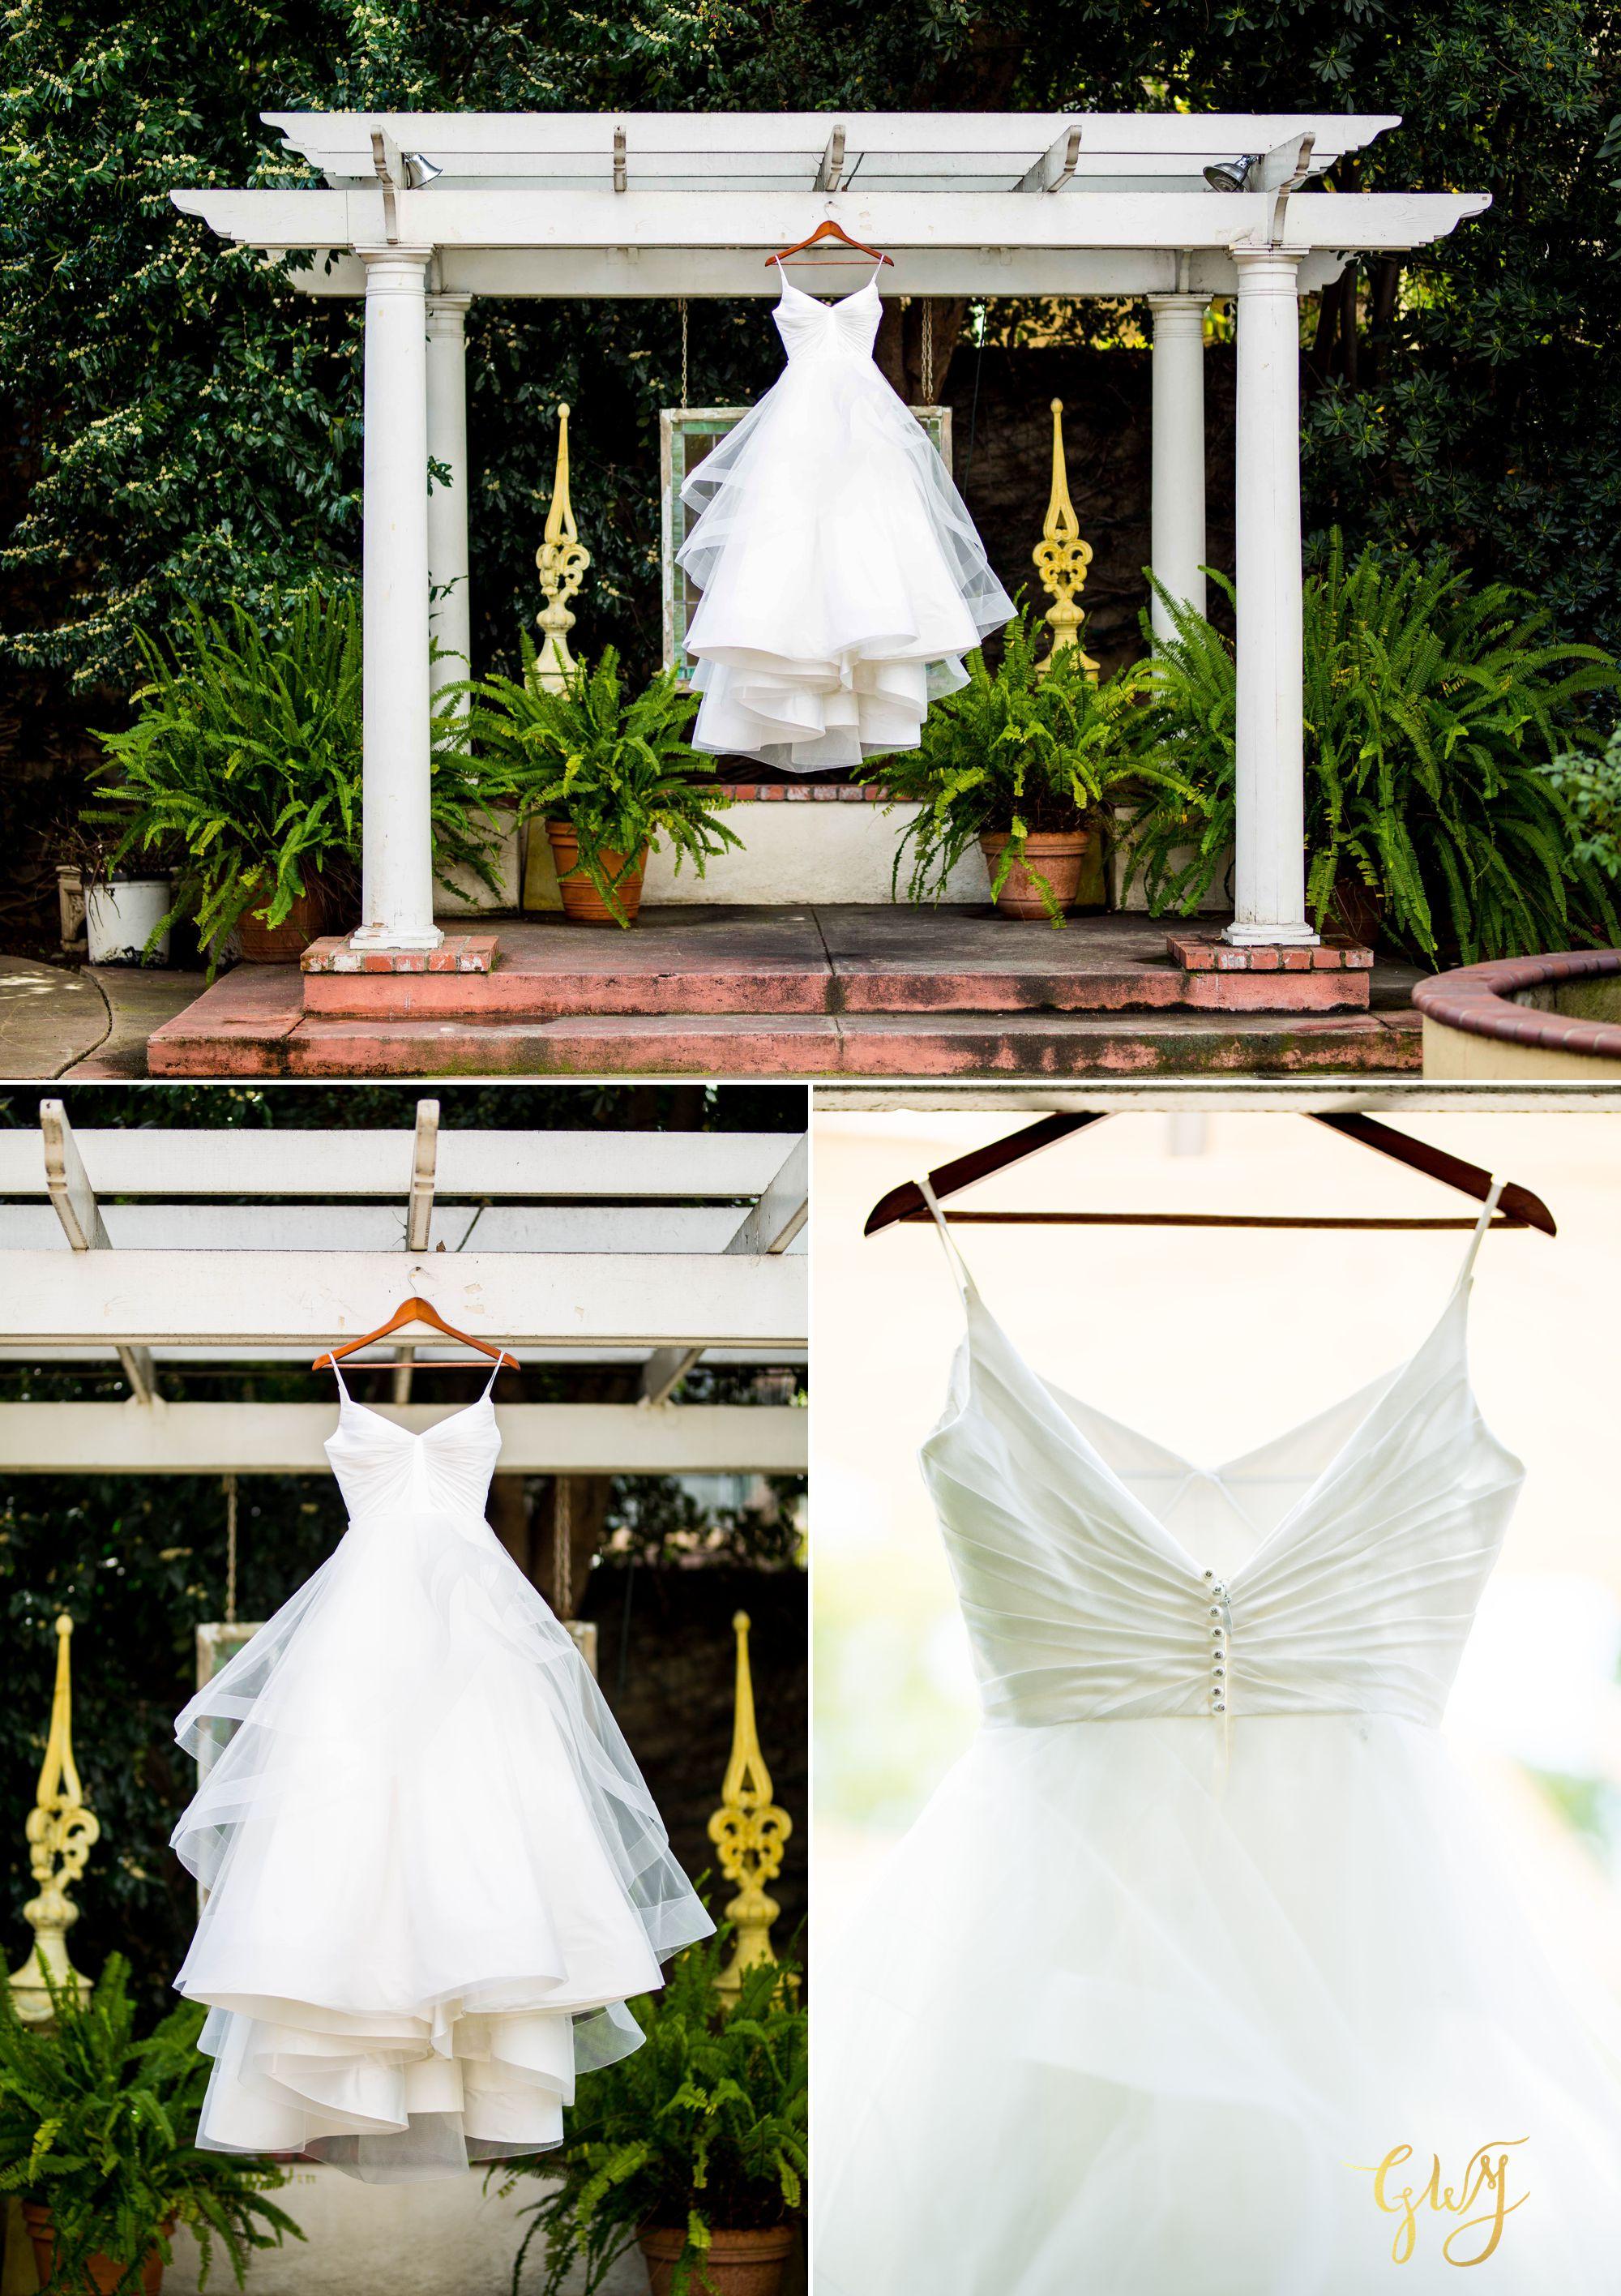 Garrett + Michelle's French Estate Orange County Spring Wedding by Glass Woods Media 3.jpg